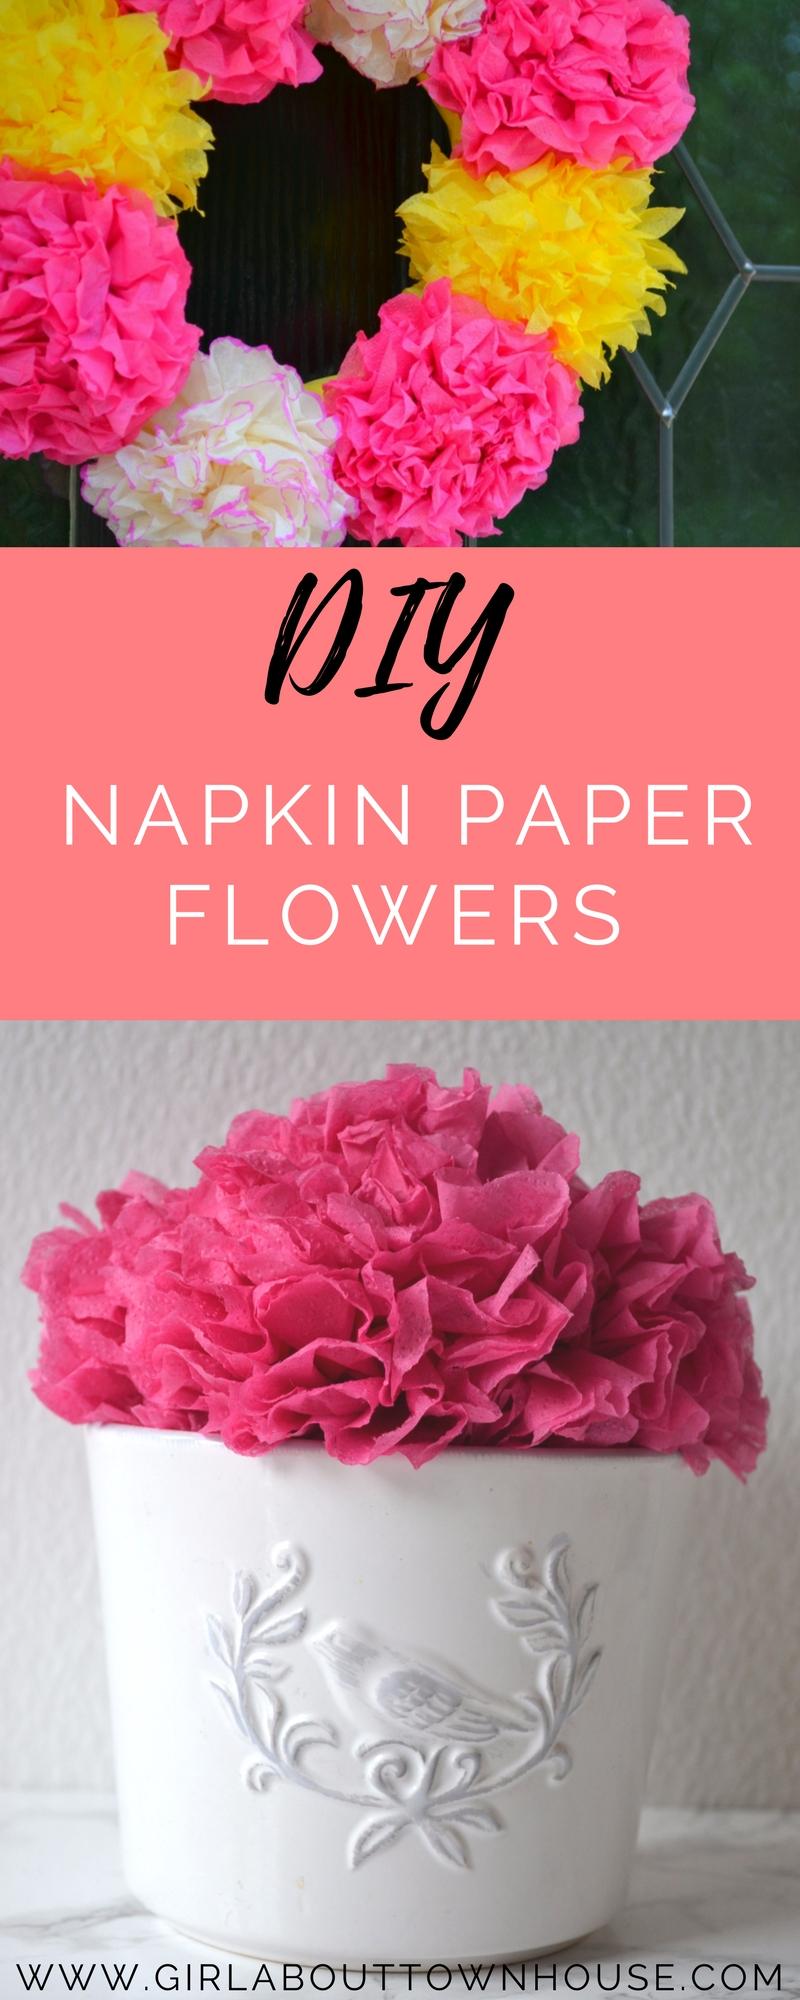 Tissue paper flower video yolarnetonic tissue paper flower video mightylinksfo